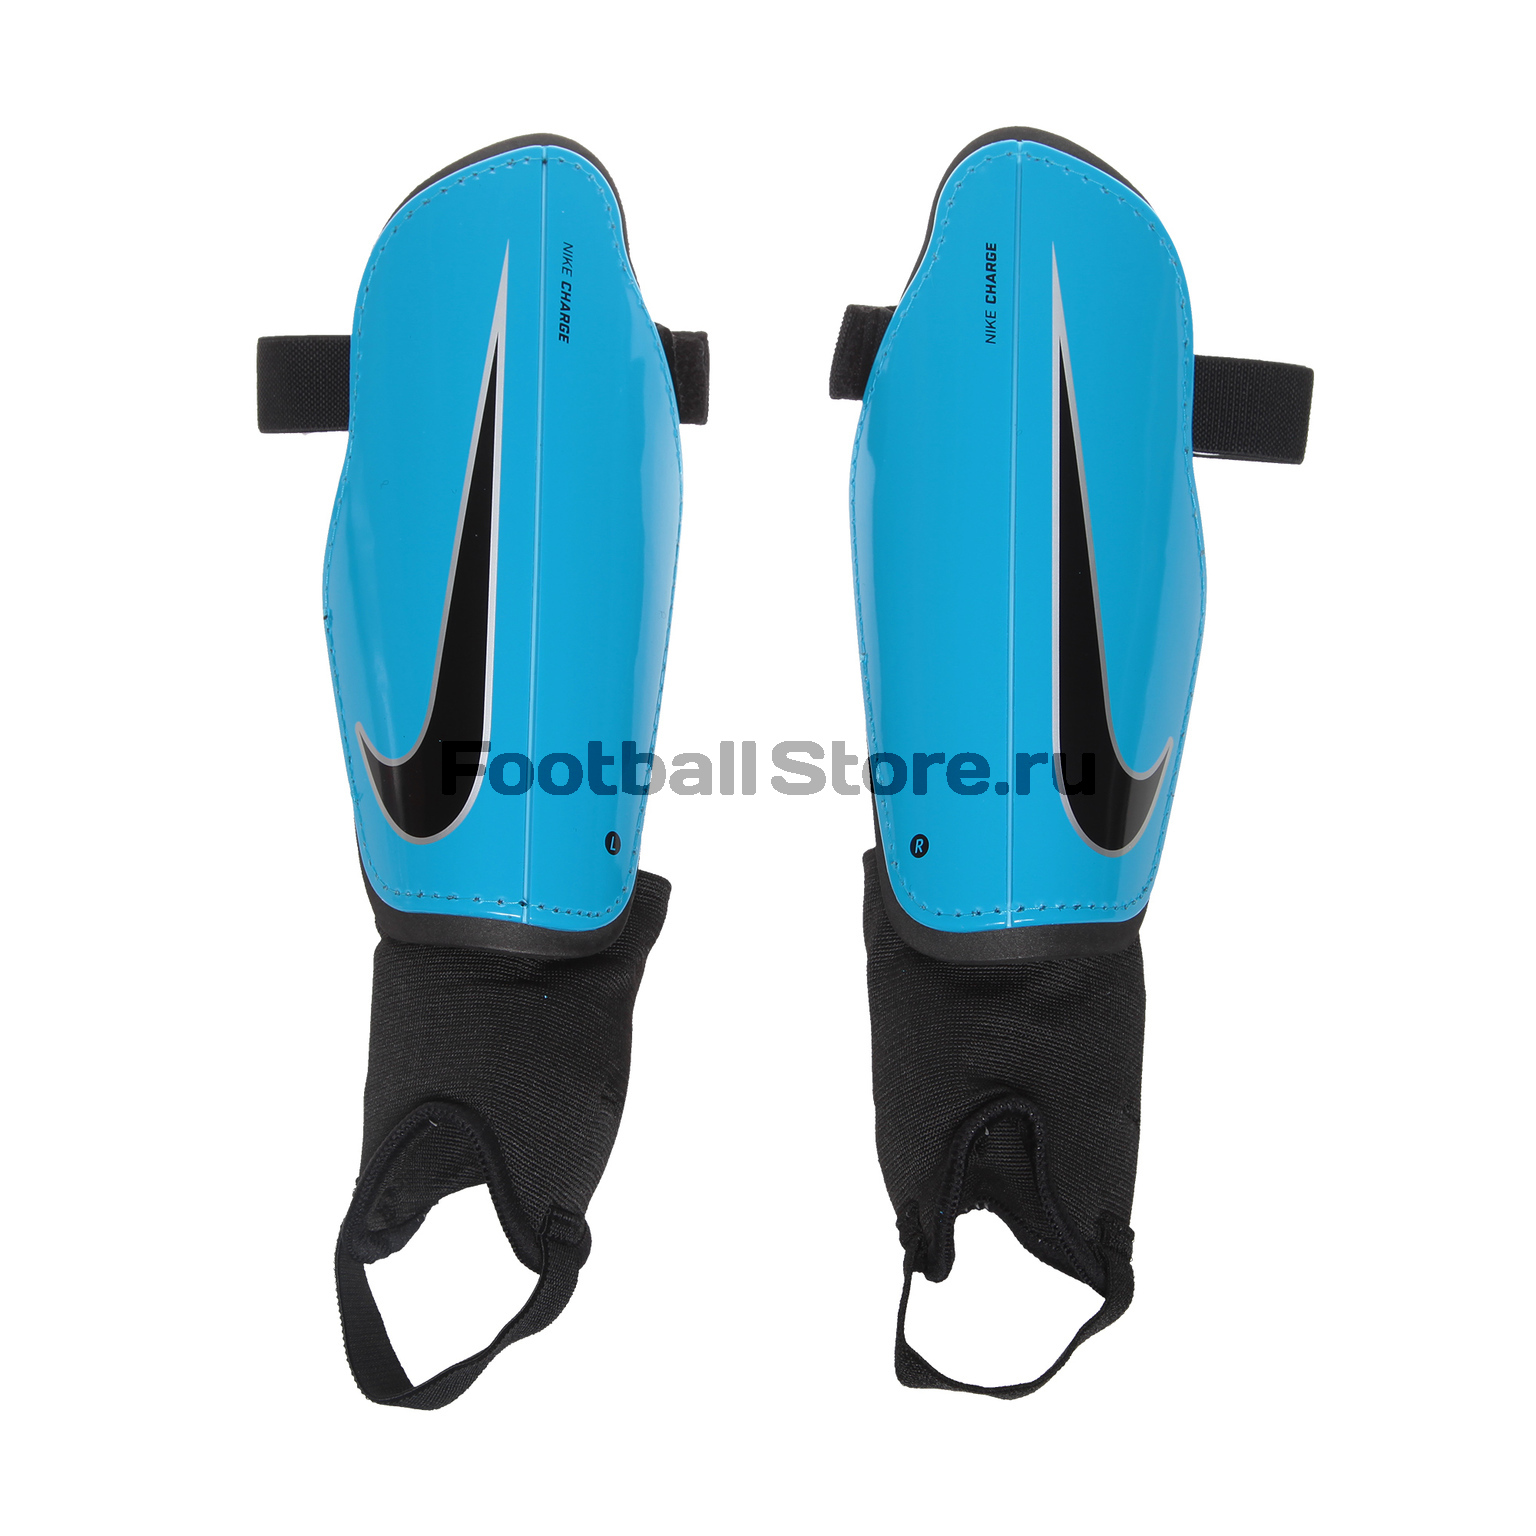 Щитки Nike NK CHRG GRD SP2093-413 щитки nike щитки nk merc lt grd